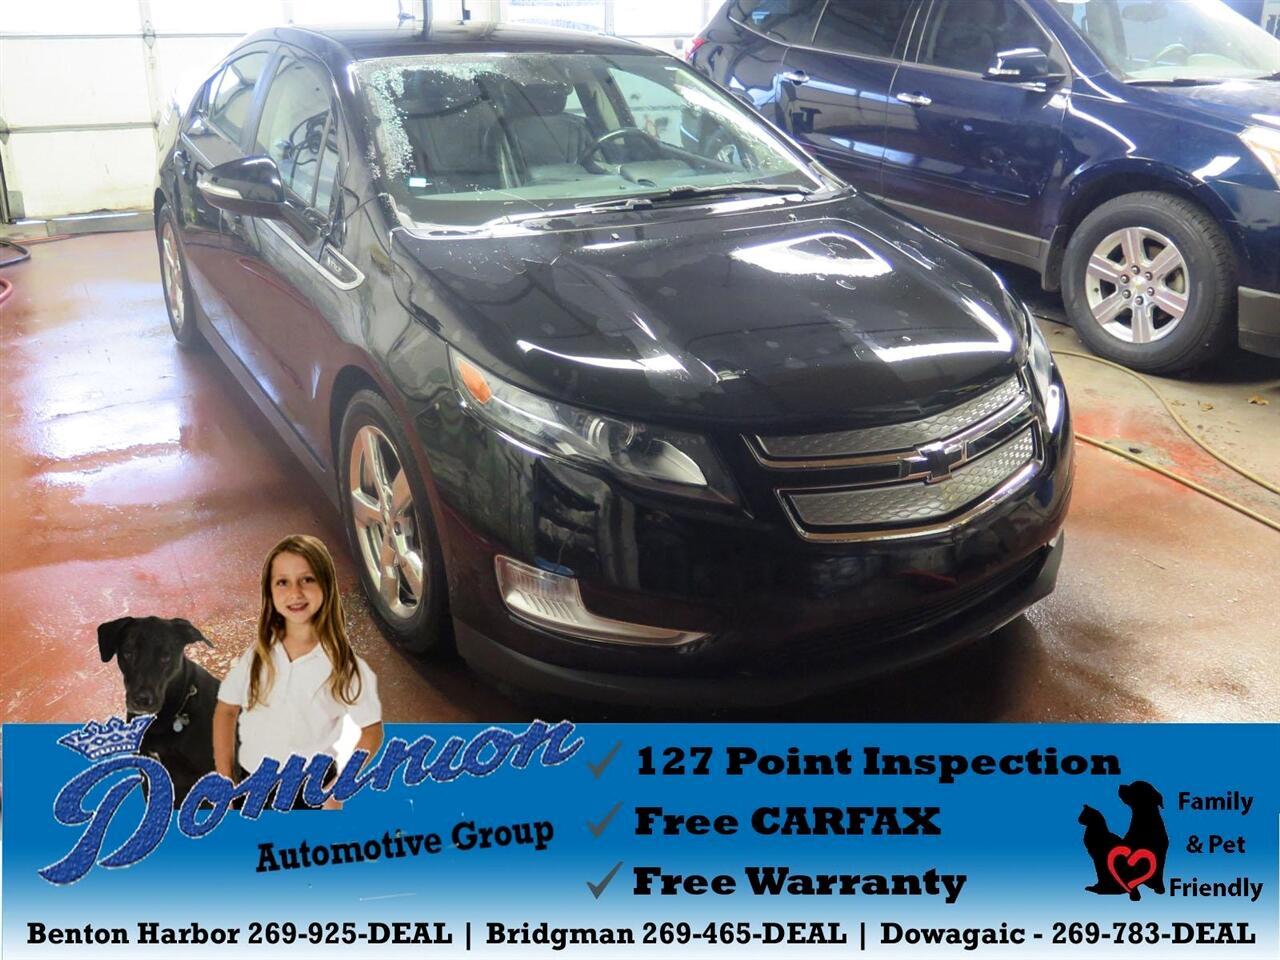 2012 Chevrolet Volt Premium w/ Navigation